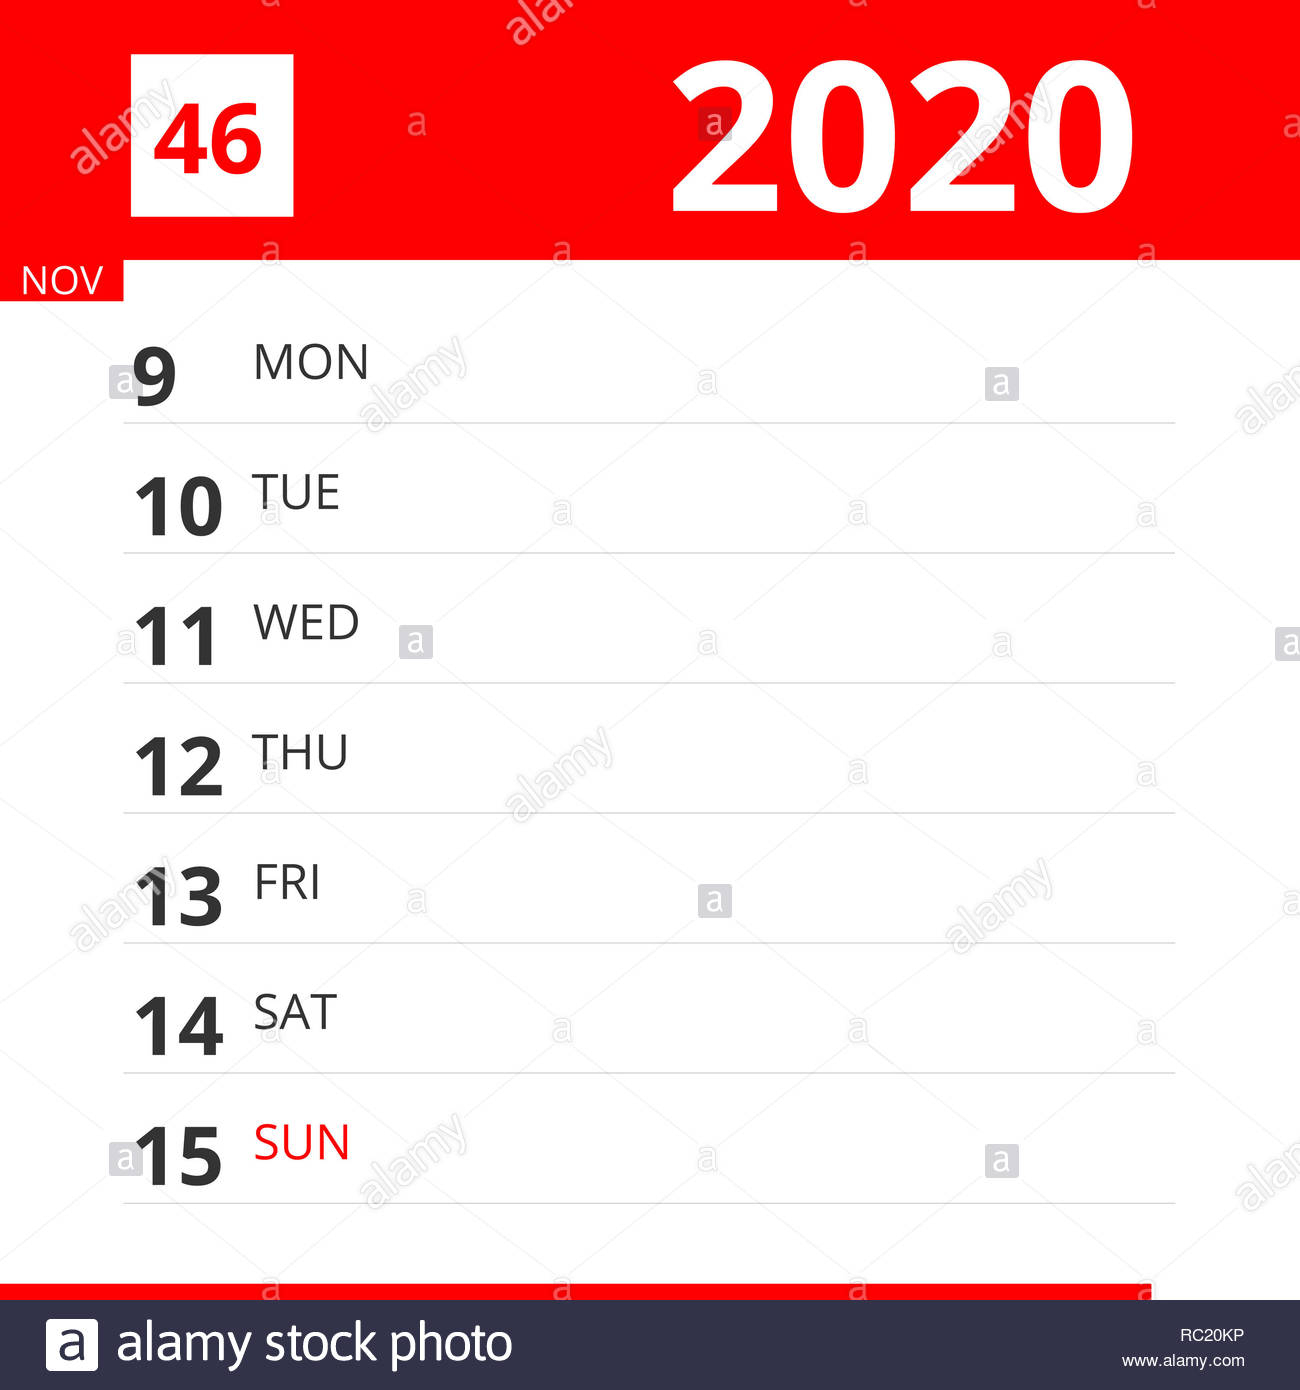 Calendar Planner For Week 46 In 2020, Ends November 15, 2020